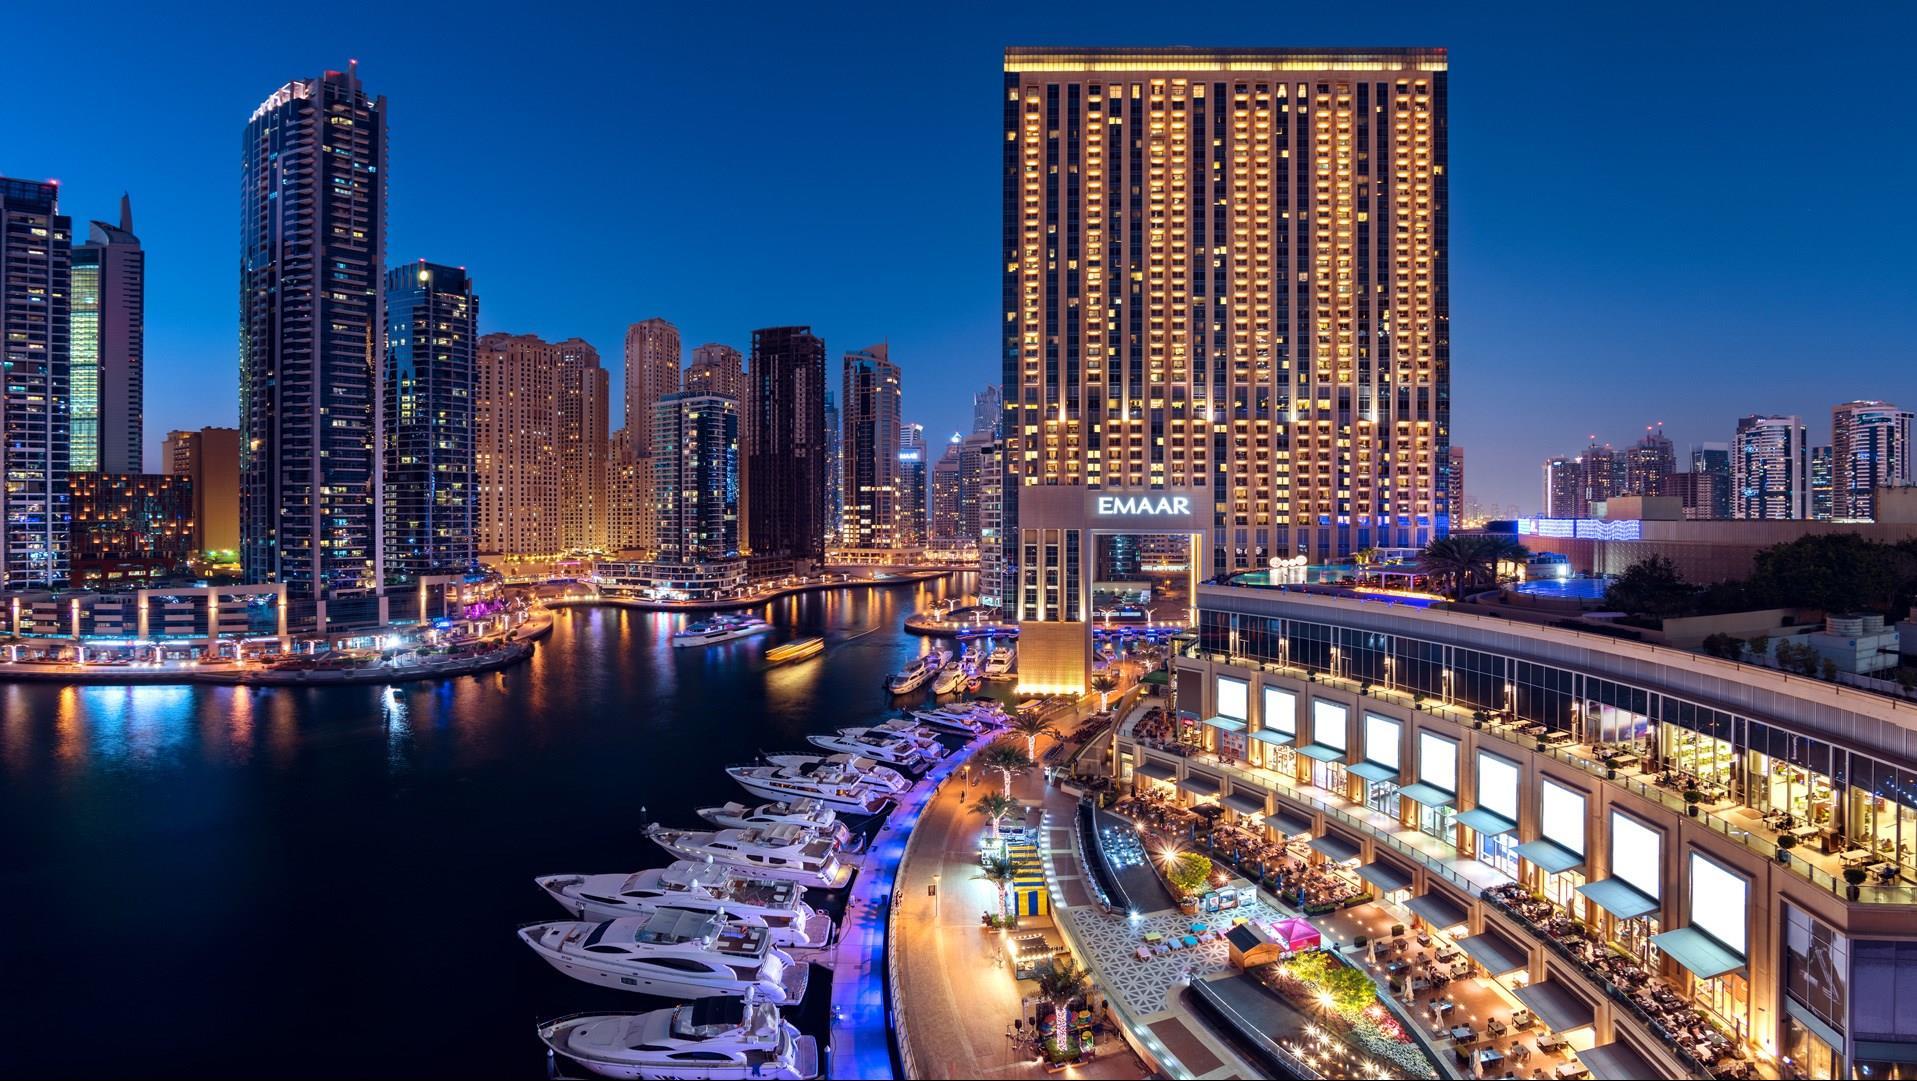 Address, Dubai Marina at Night | Dubai Marina | The Vacation Builder